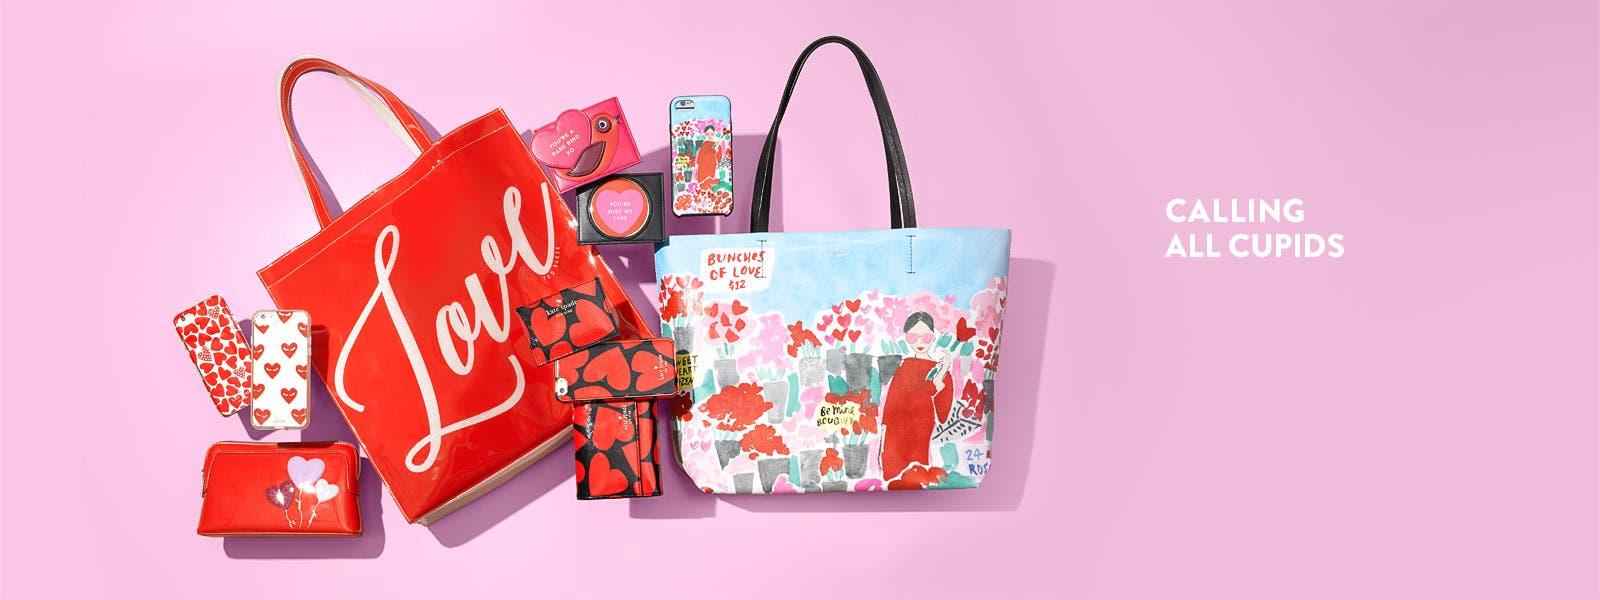 Calling all cupids: women's handbag gifts.